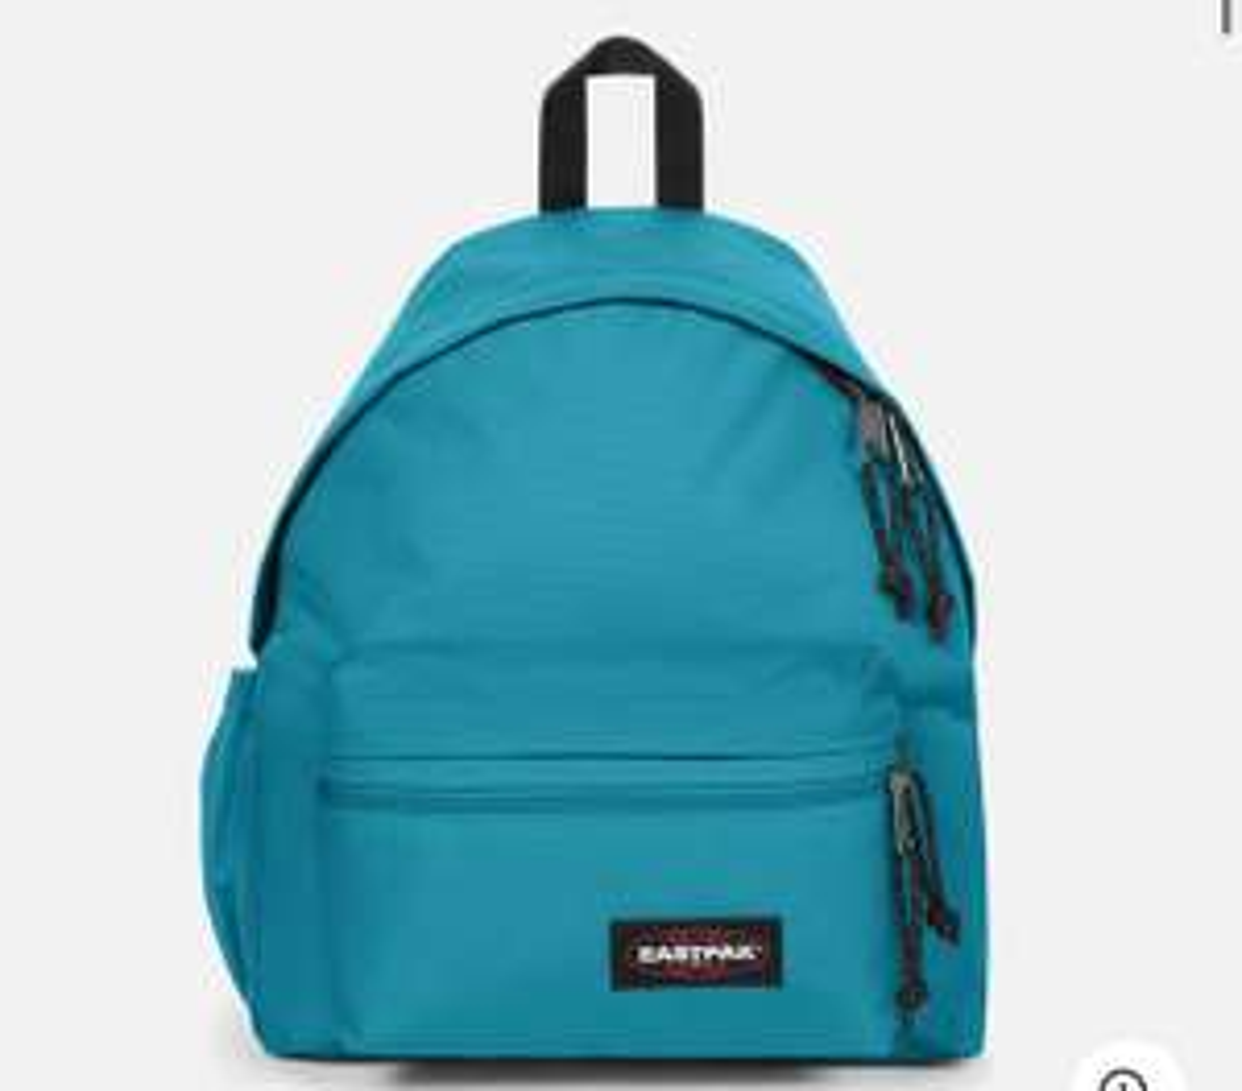 Eastpak Padded Zippl'r+ Backpack - Oasis Blue - £13.50 + £2.99 C&C or £4.99 delivery @ The Hut